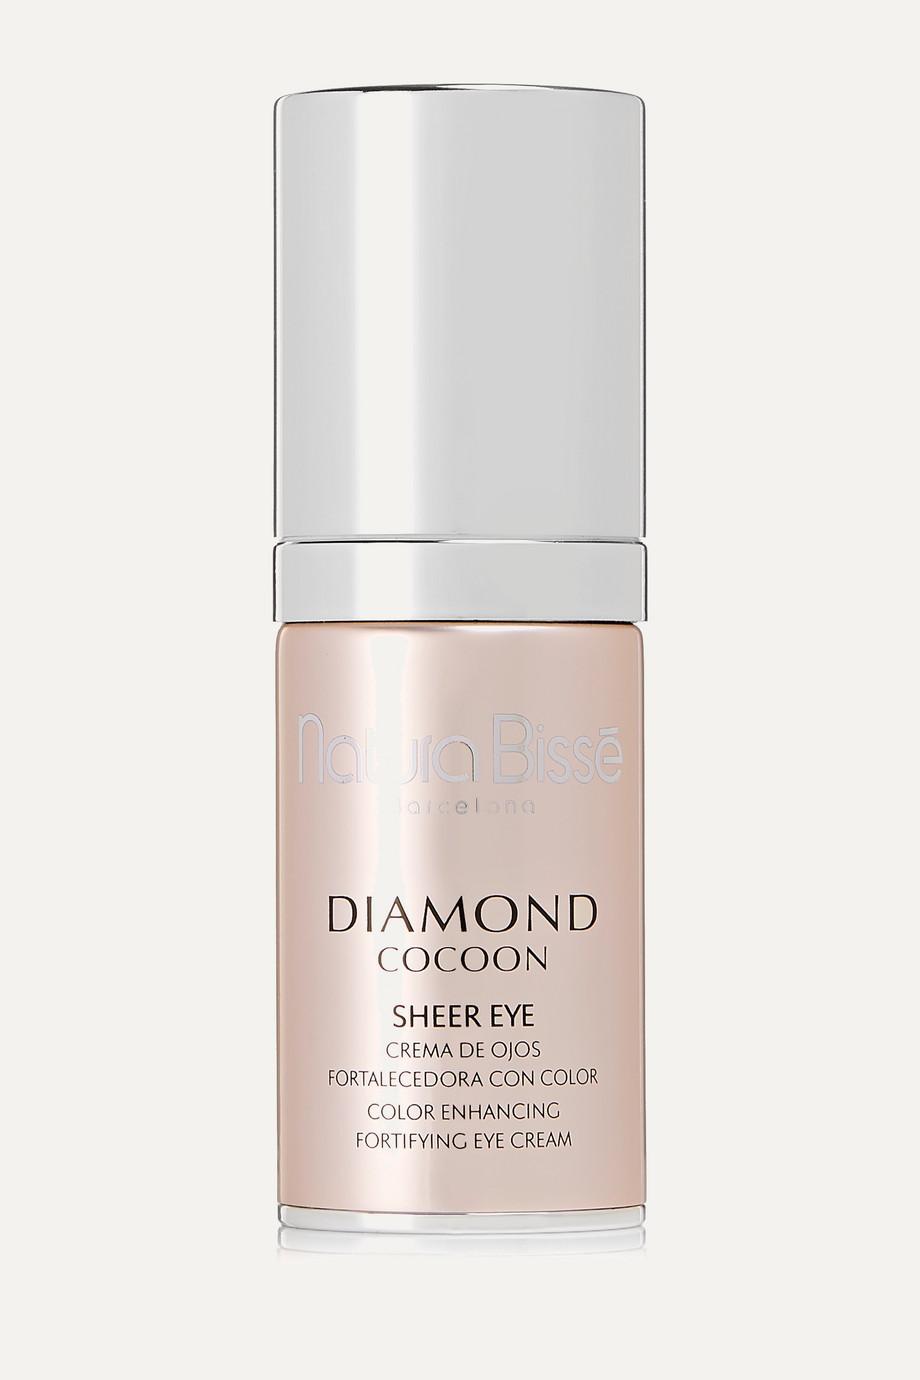 Natura Bissé Diamond Cocoon Color Enhancing Fortifying Eye Cream, 25ml